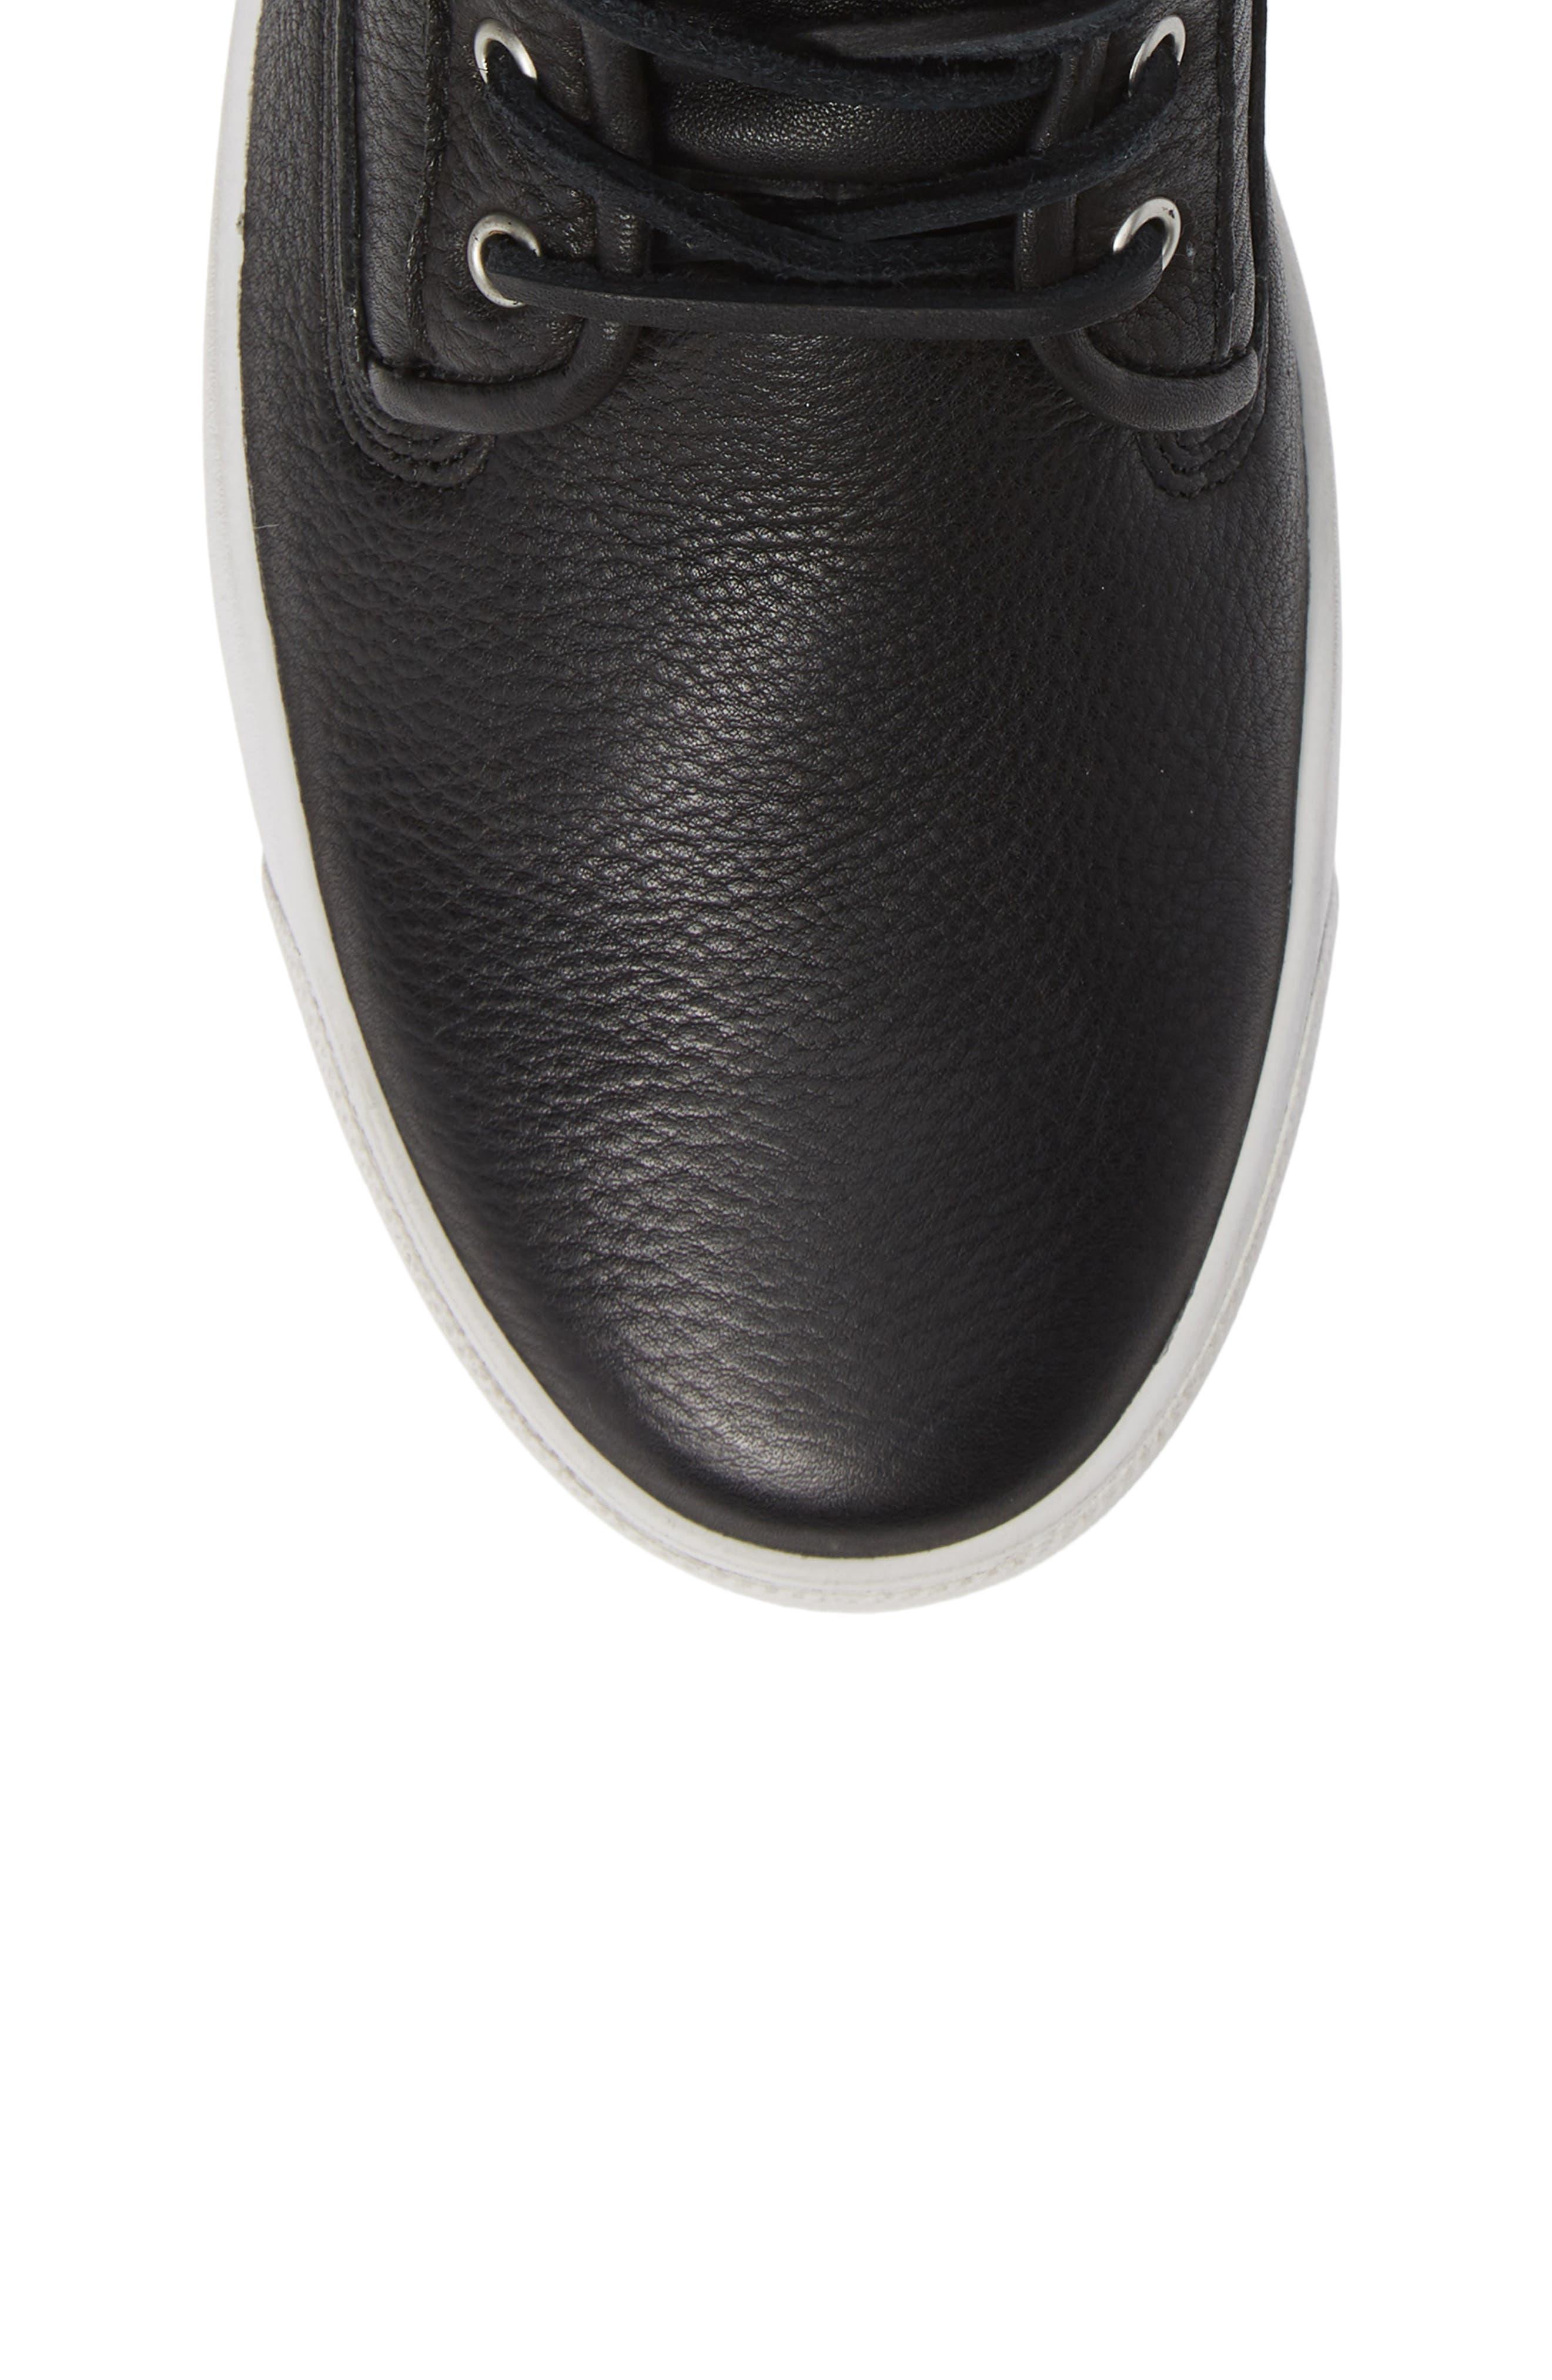 QM80 High Top Sneaker,                             Alternate thumbnail 5, color,                             BLACK